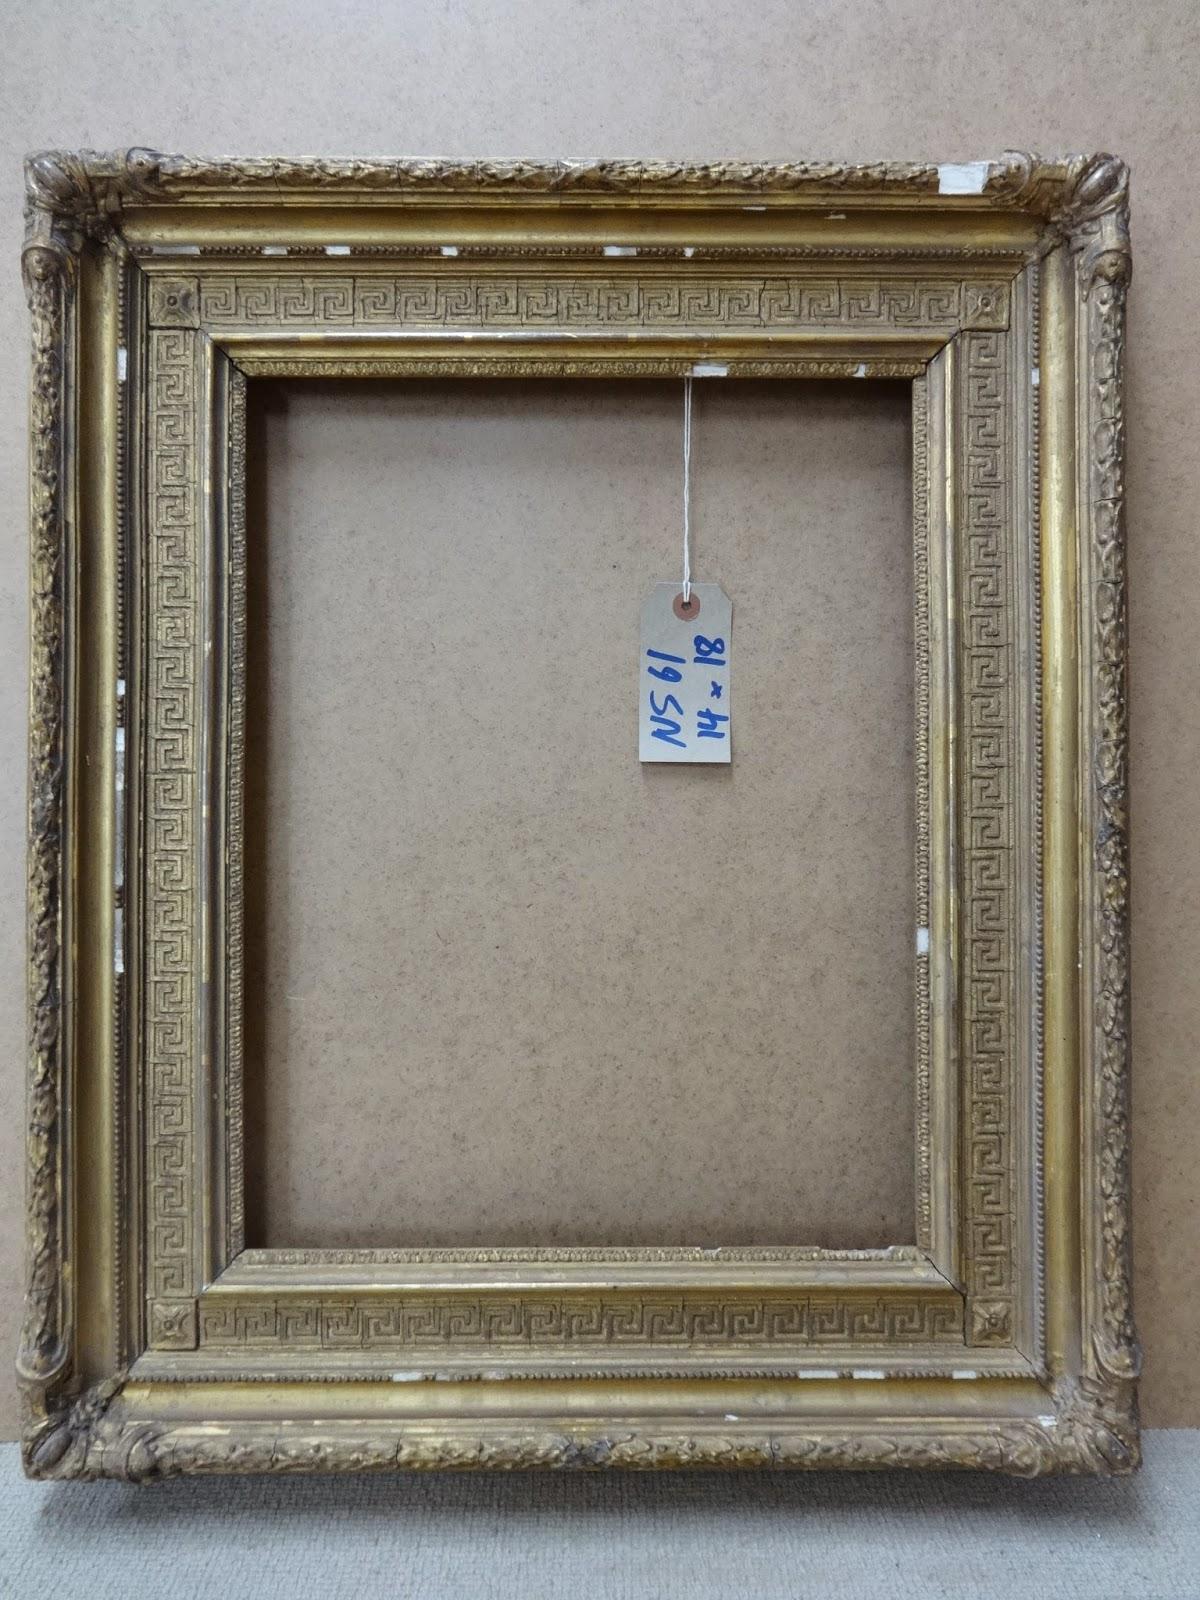 Antique frame sale a 19th century neoclassical frame with greek a 19th century neoclassical frame with greek key pattern jeuxipadfo Gallery